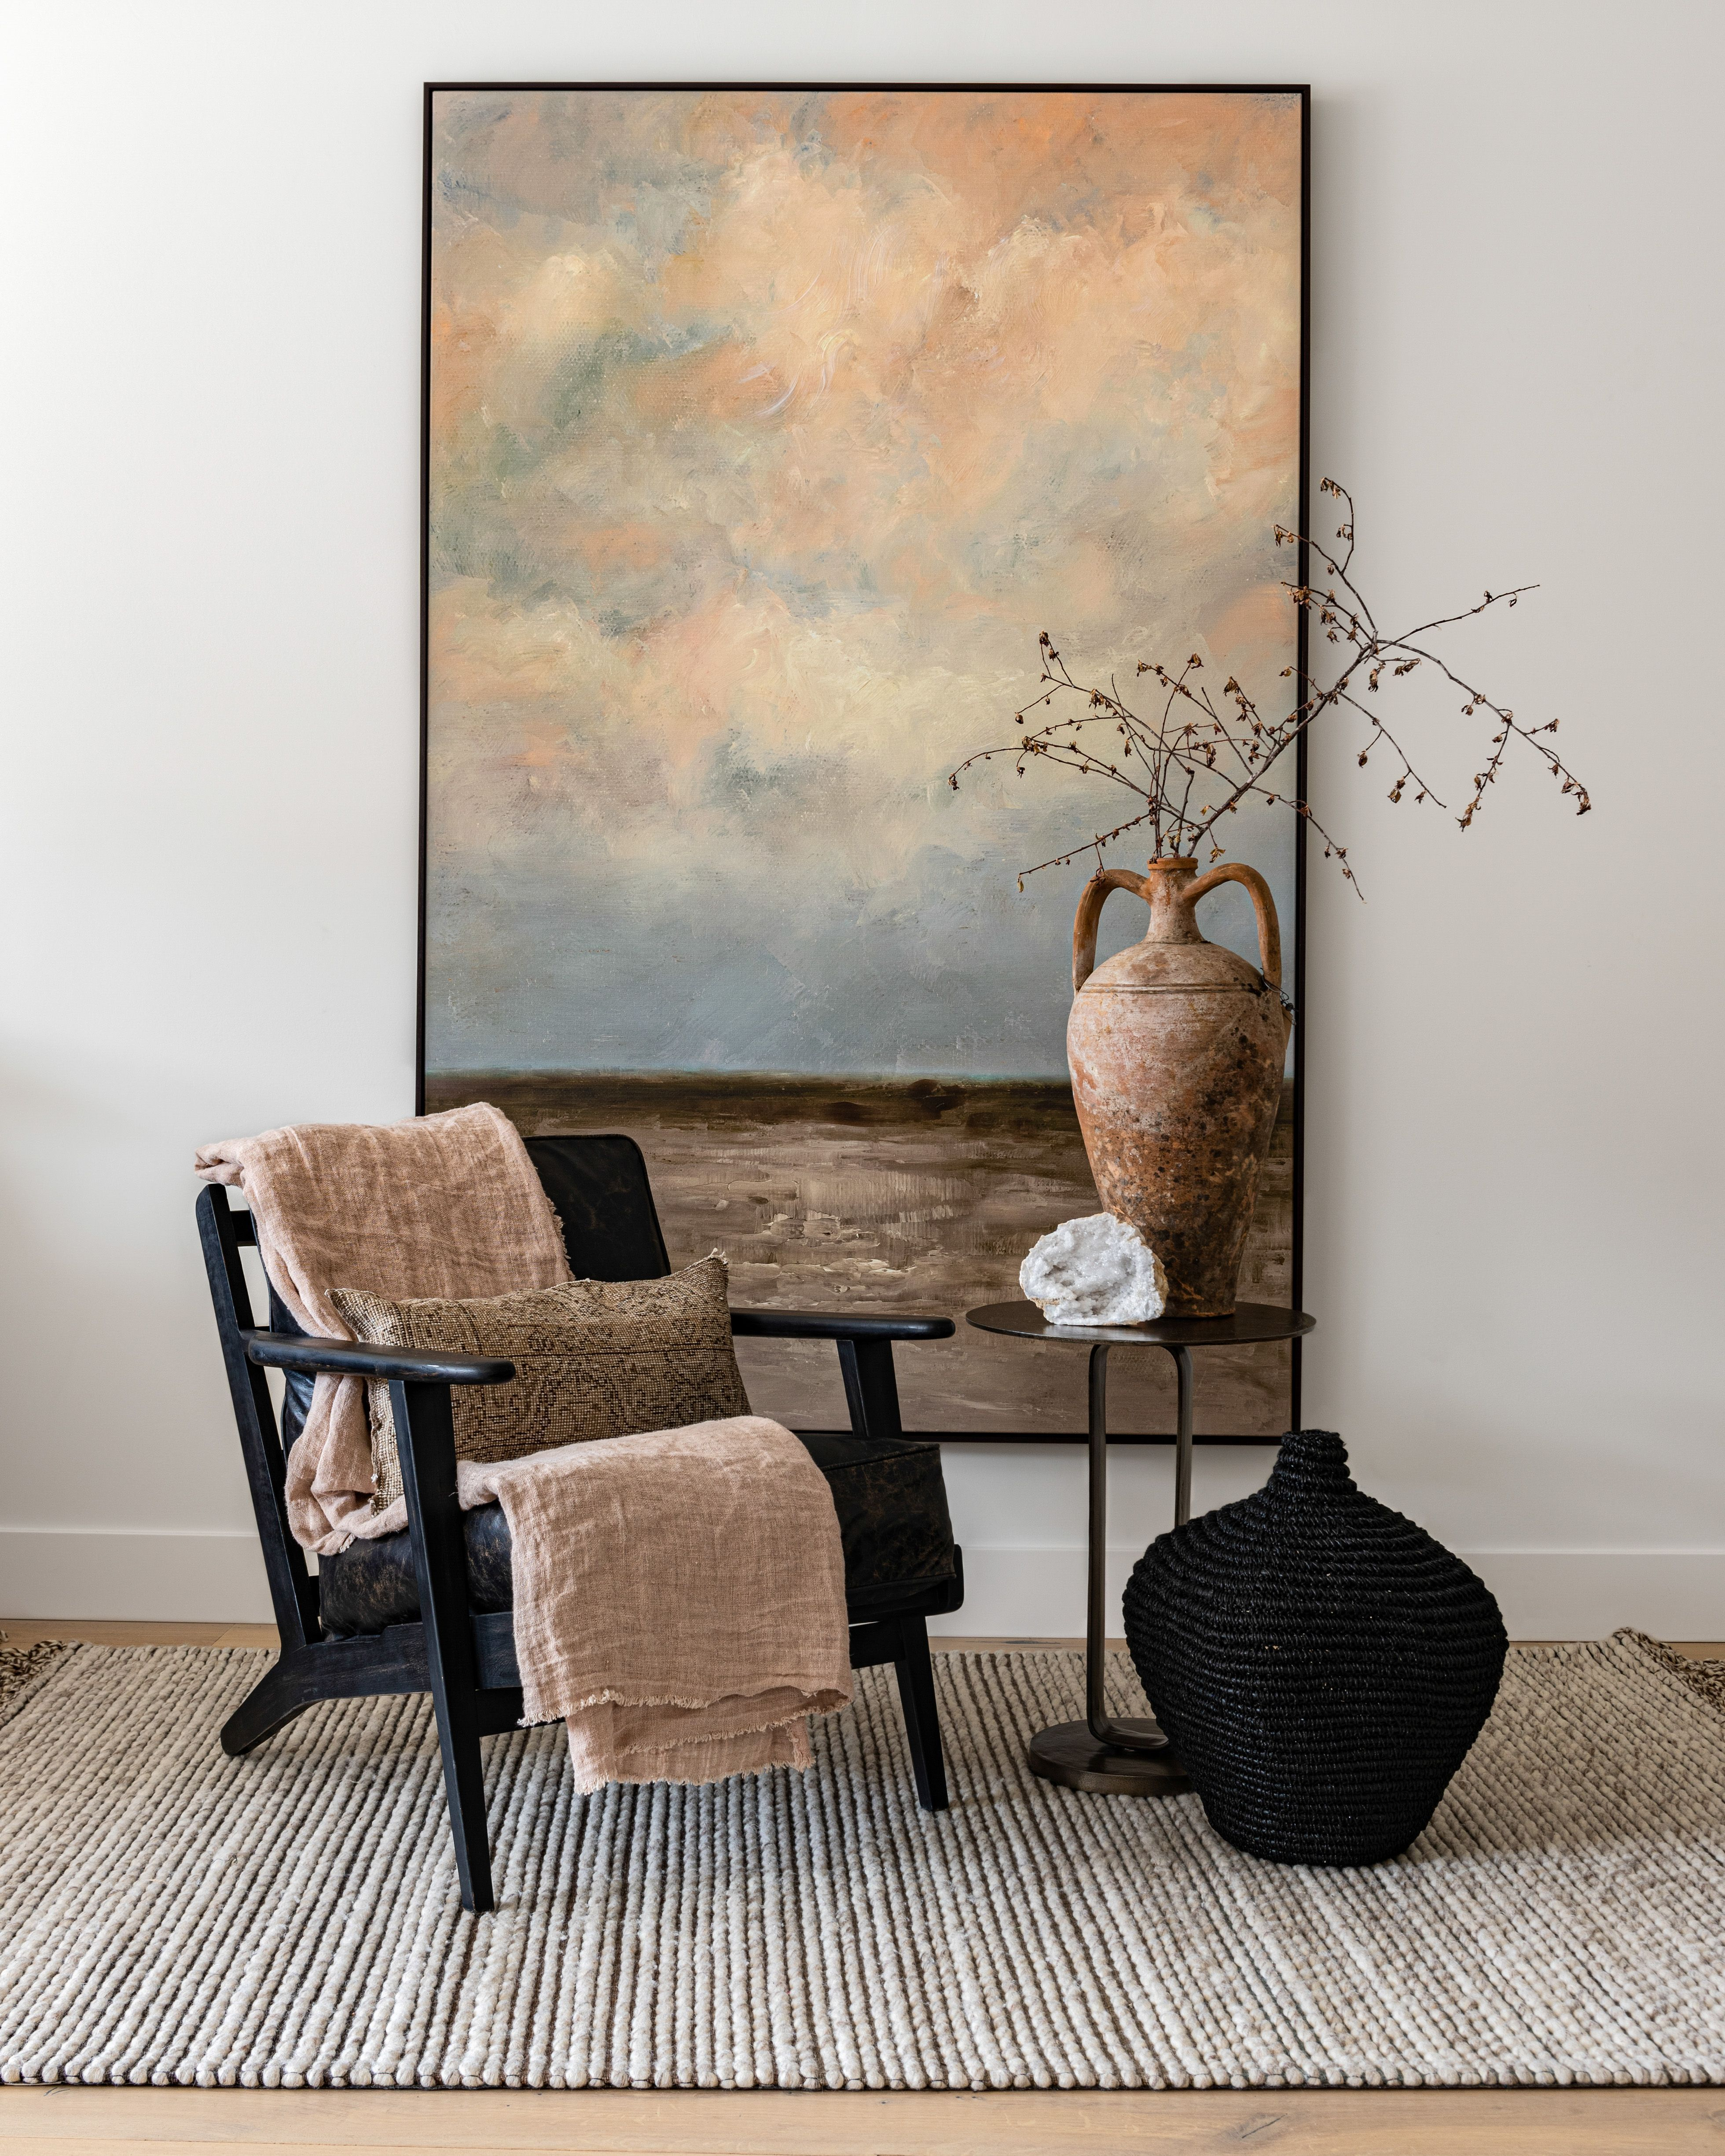 Pin By Gaga1 On Interior In 2020 Interior Architecture House Furniture Design Interior